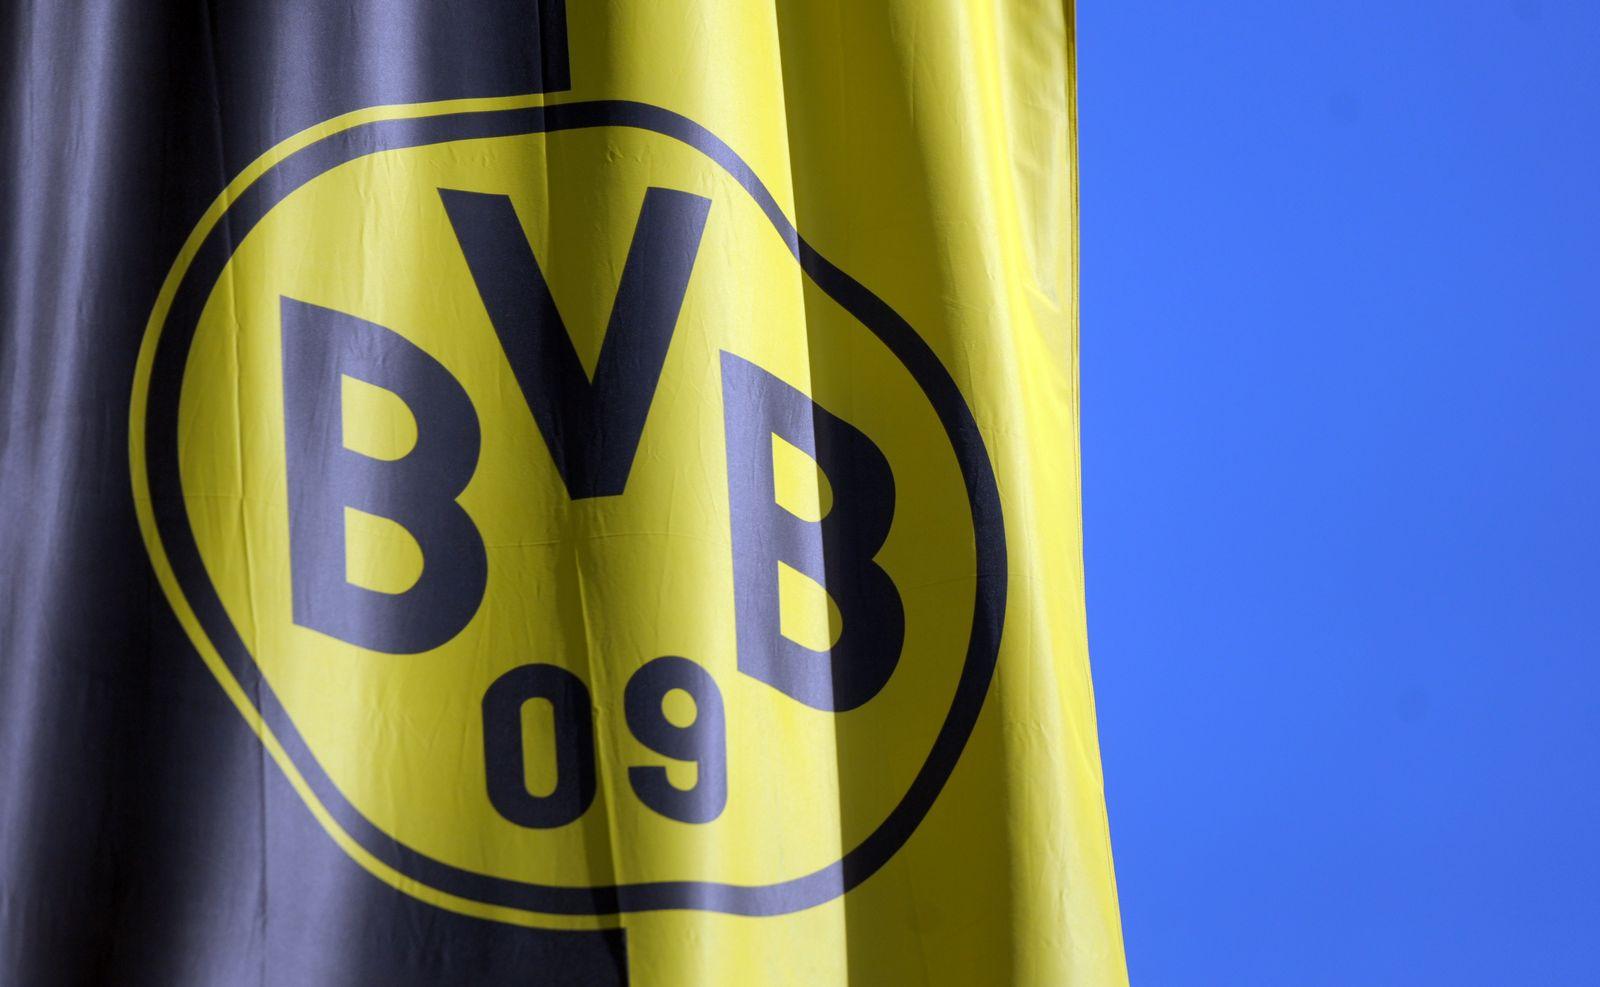 Borussia Dortmund / Logo